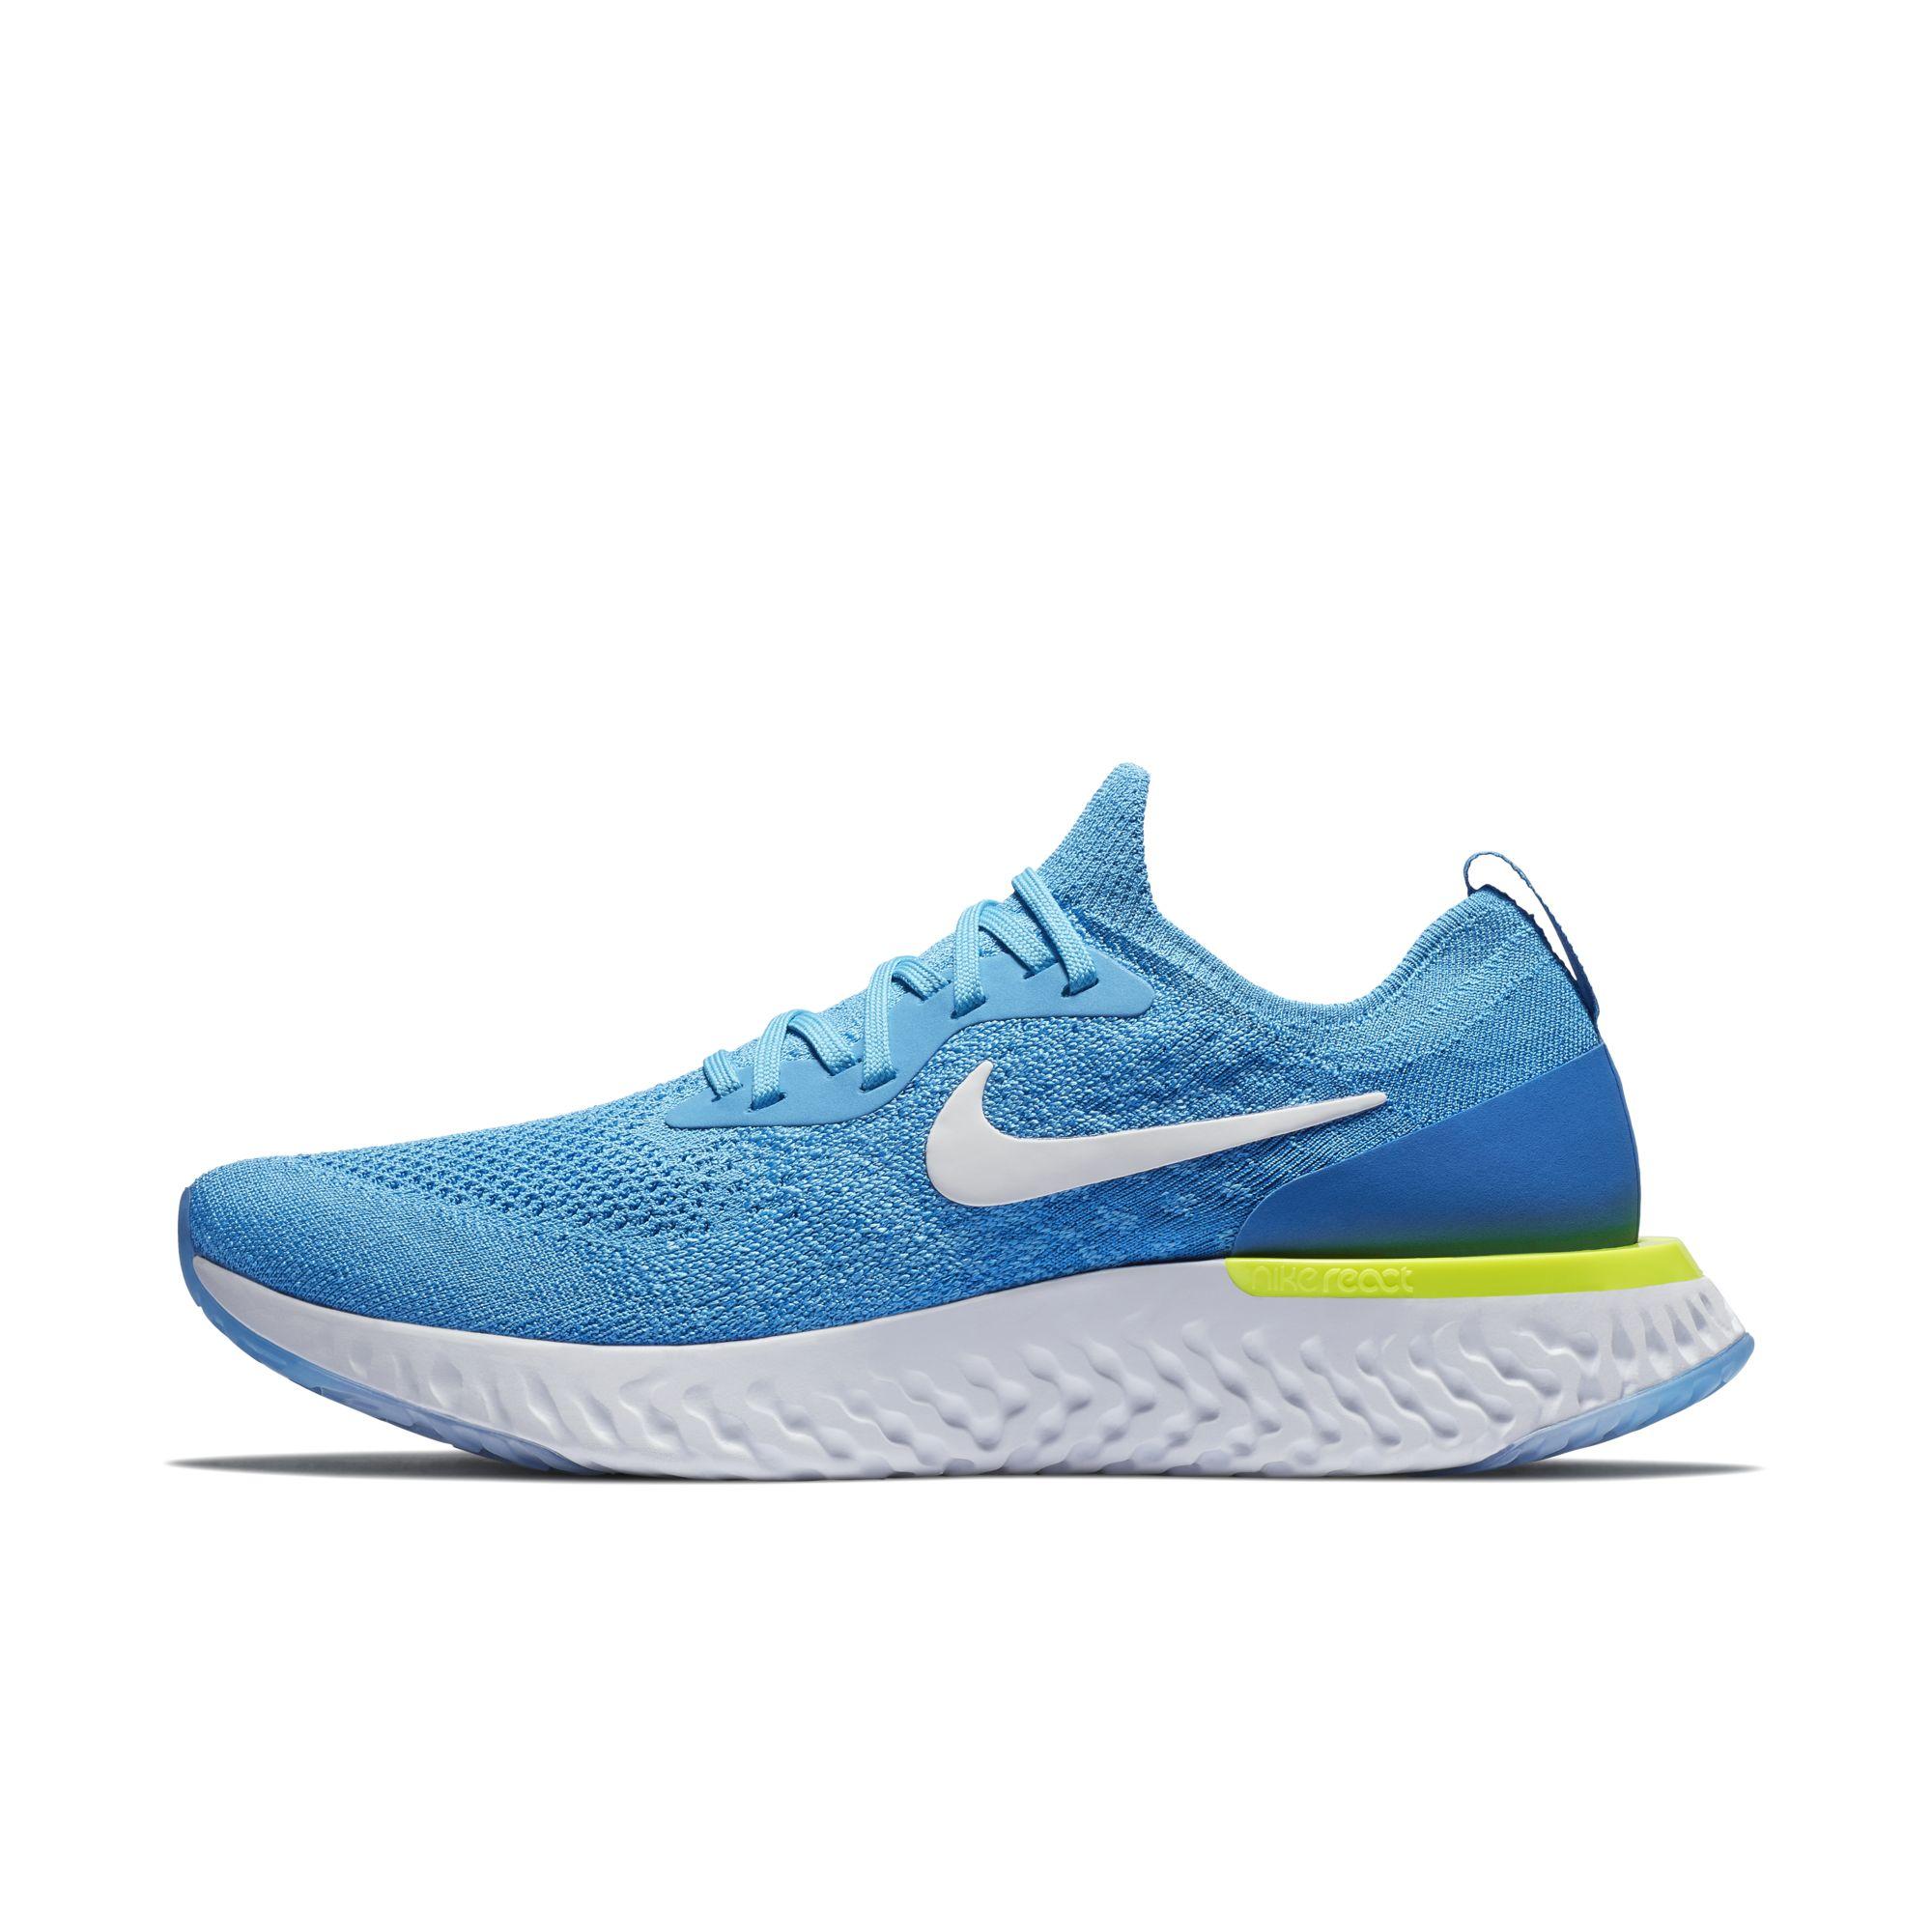 Nike PerformanceODYSSEY REACT - Neutral running shoes - photo blue/white/black/volt Zm1bYKn